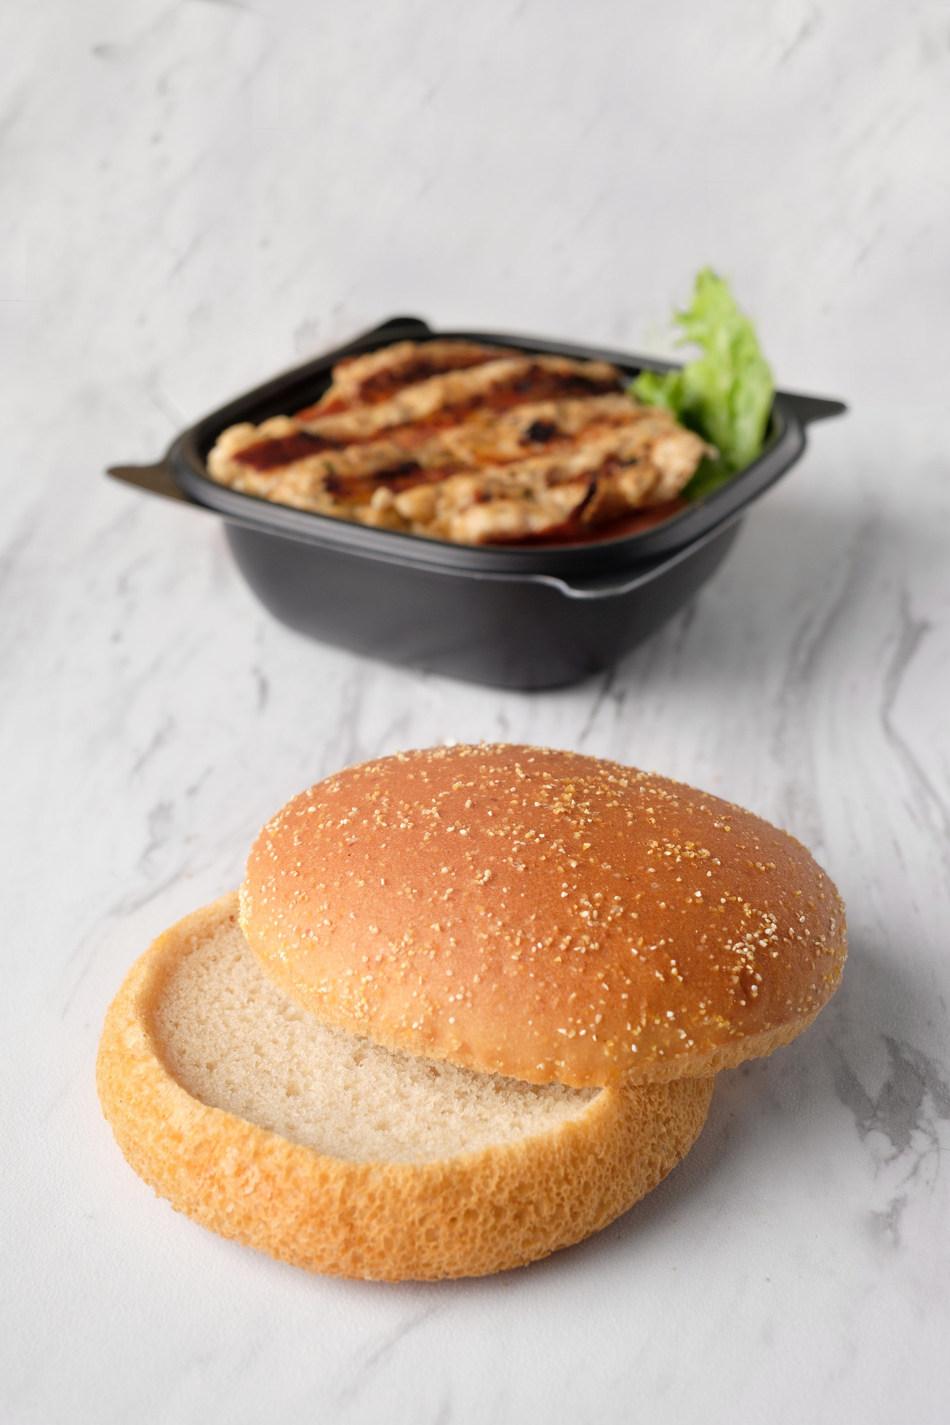 Chick-fil-A introduces new Gluten-Free Bun.